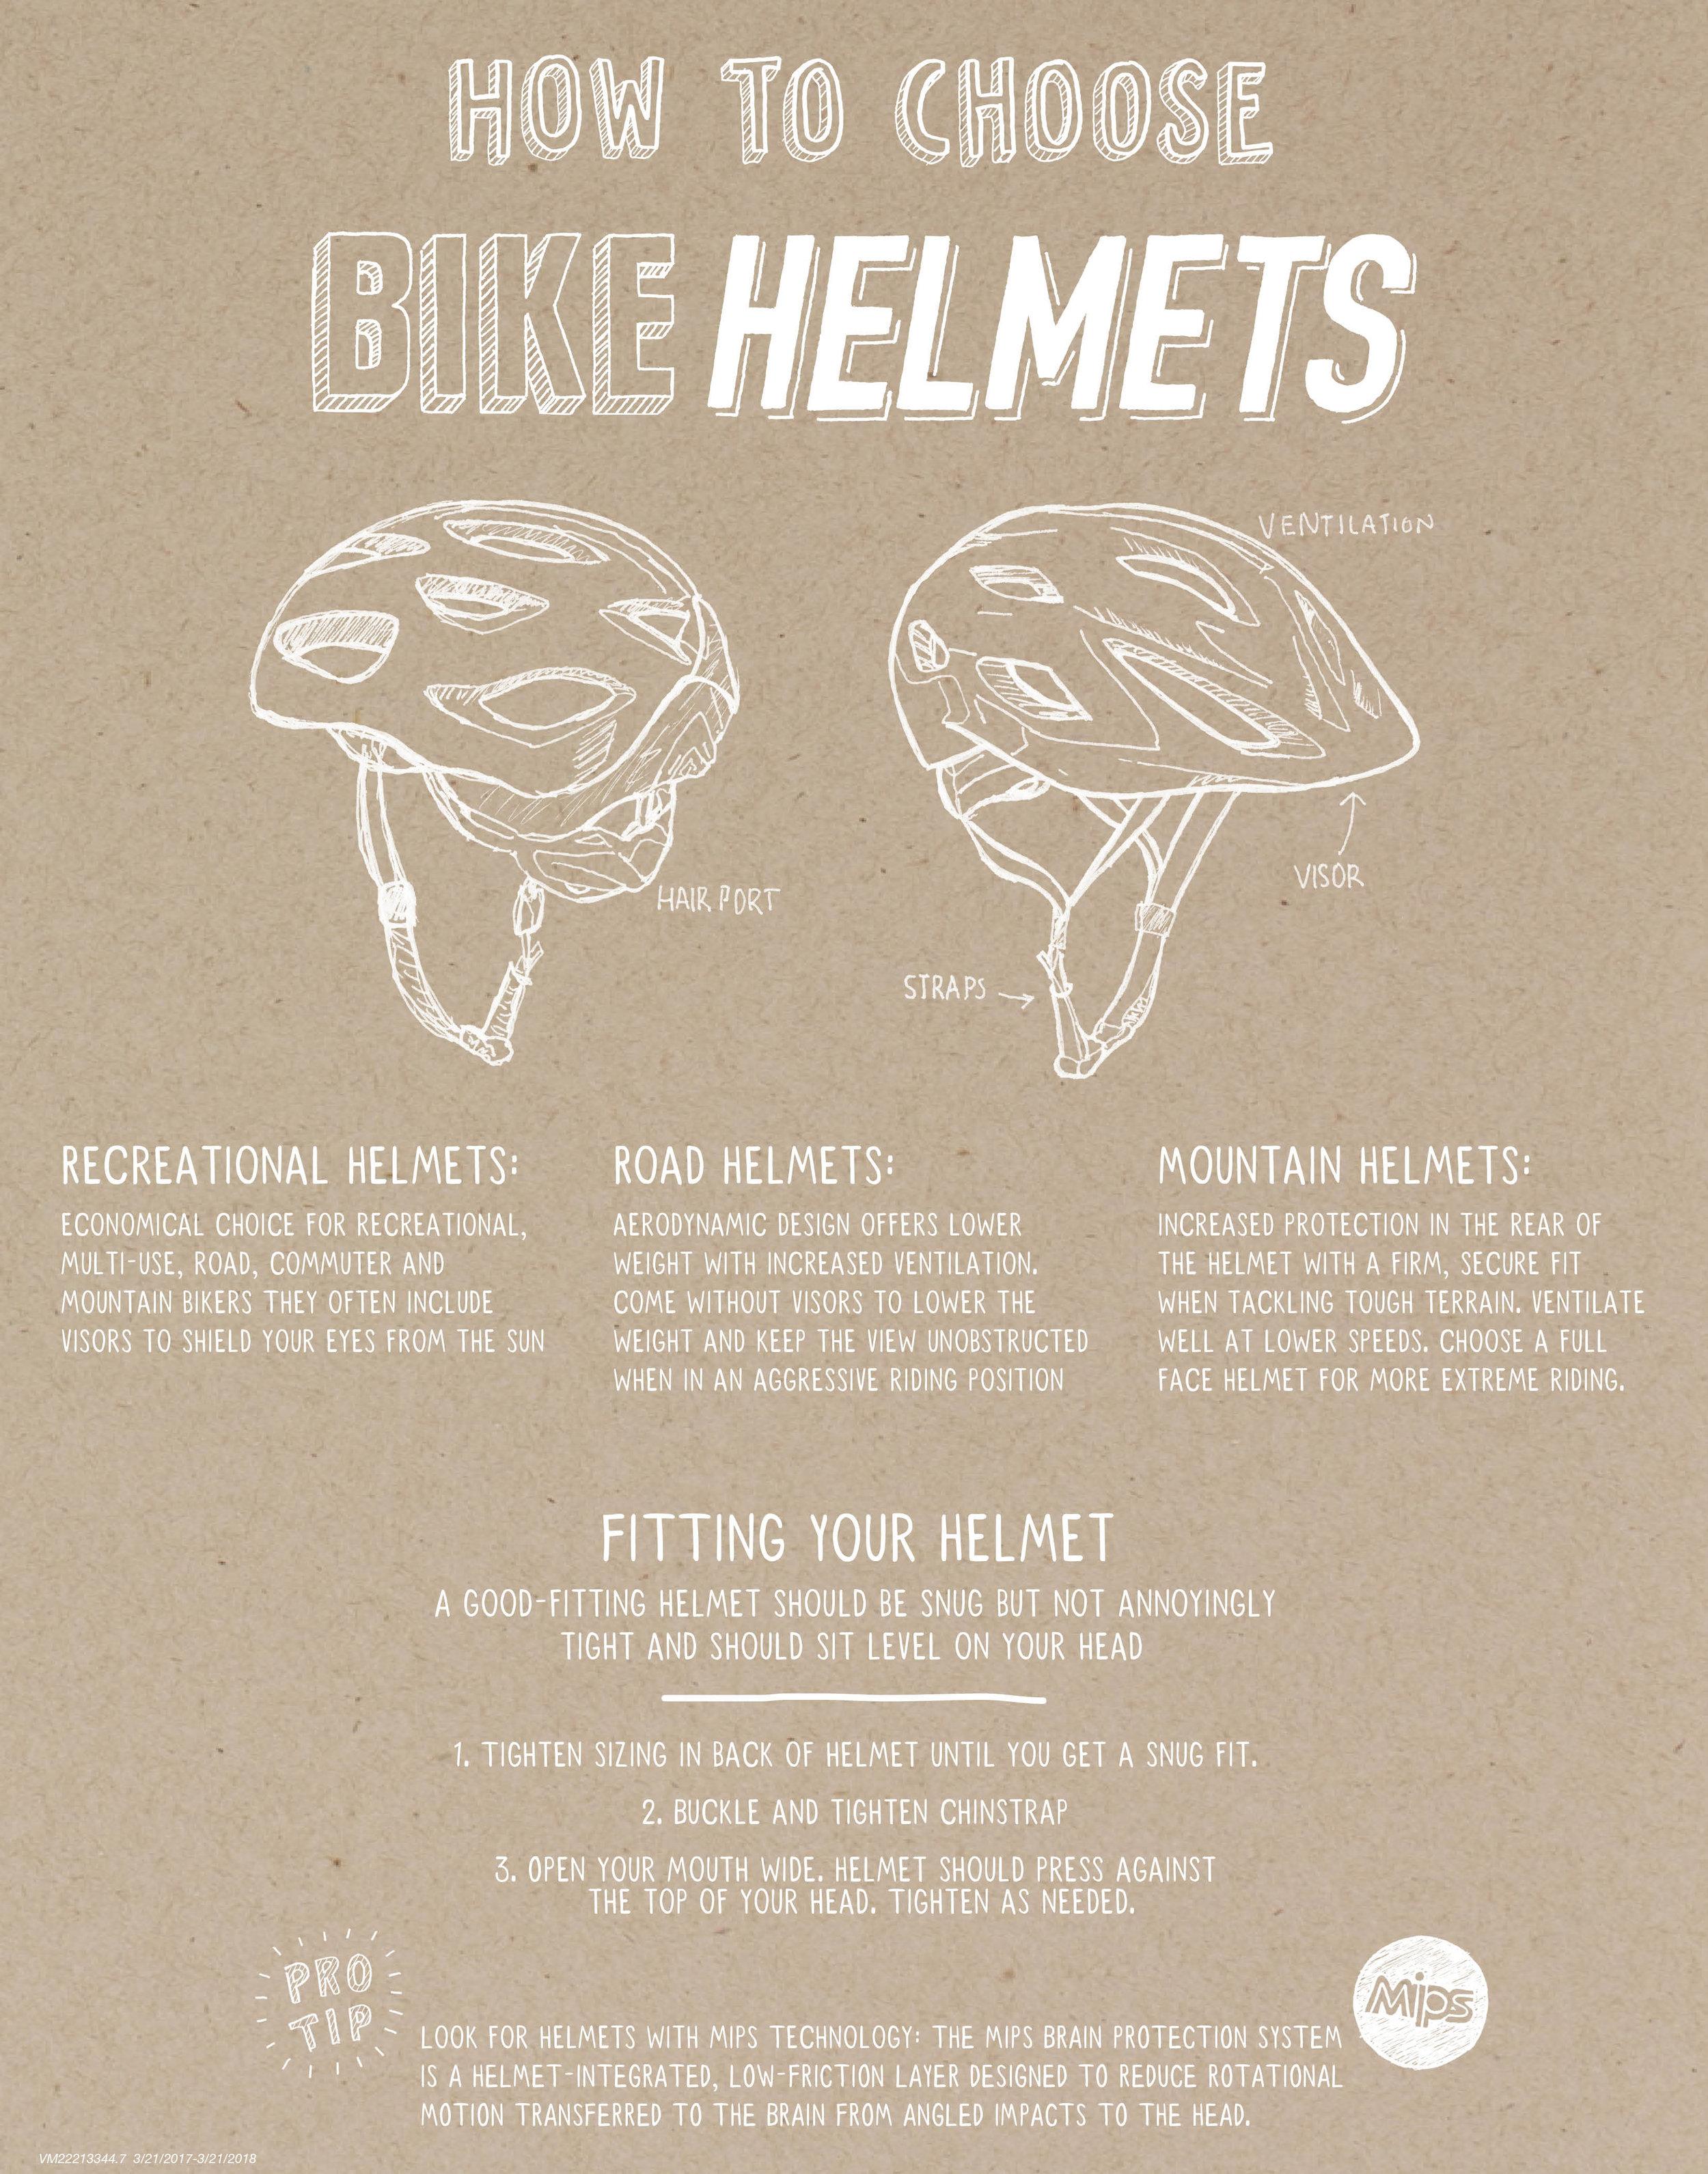 Kraft_VM22213344.5-.7_HTB_BikeHelmets 3.jpg